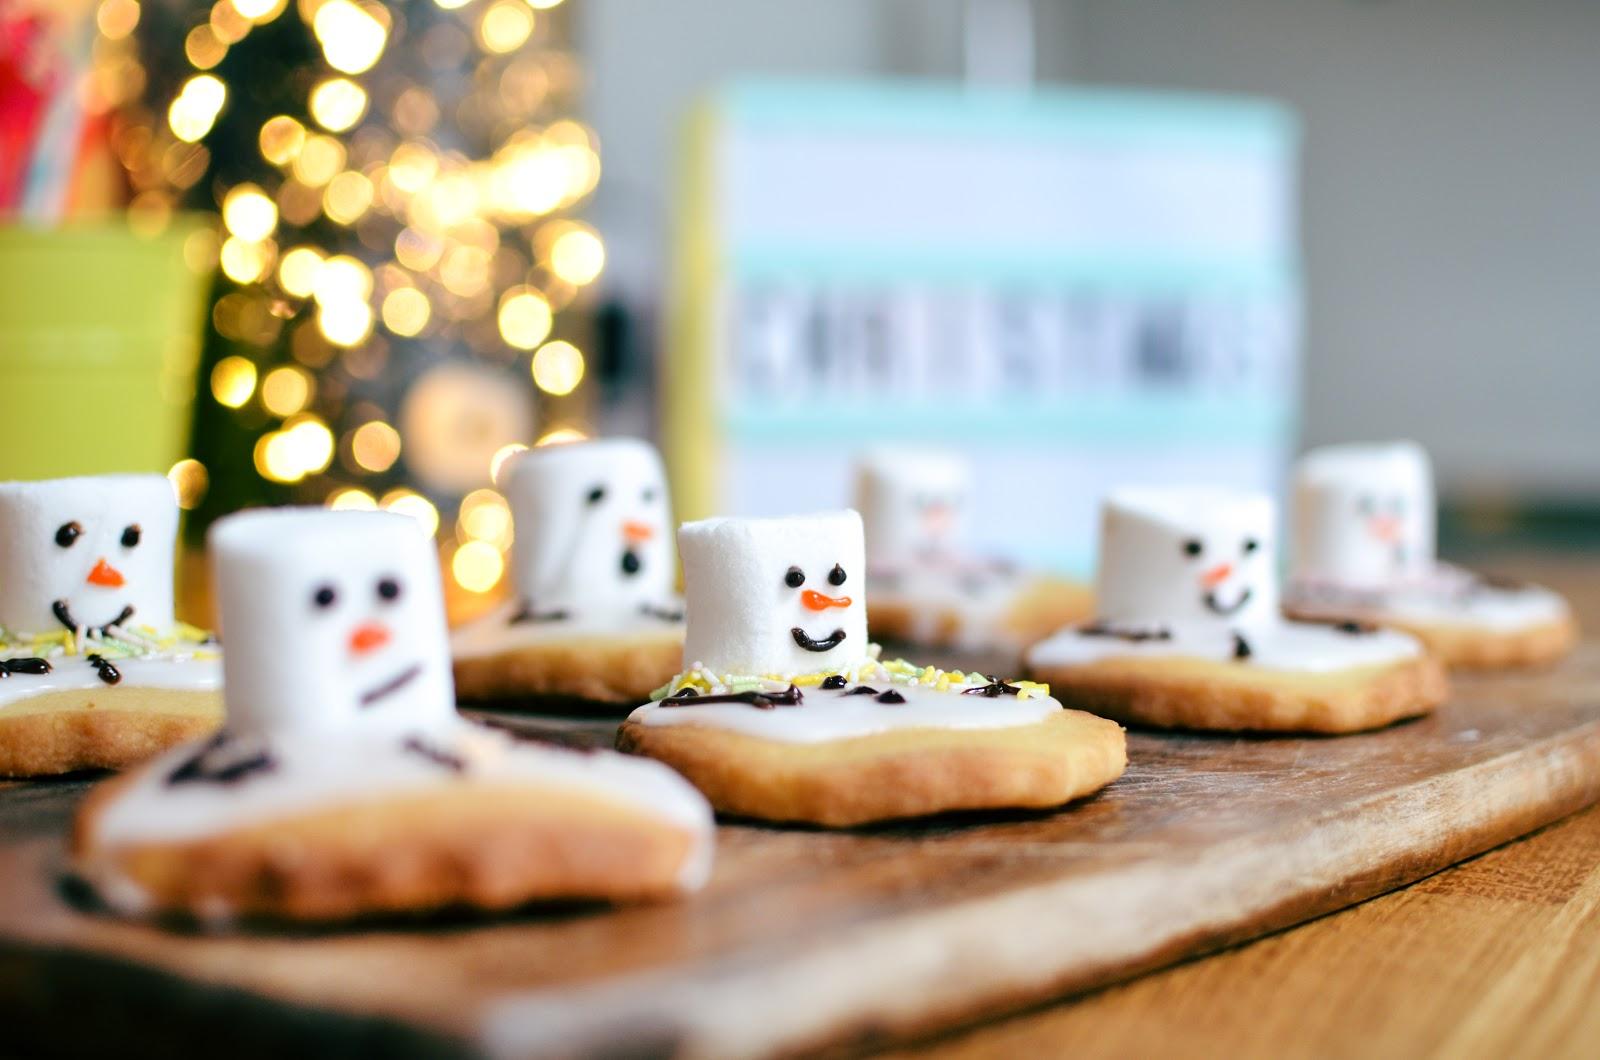 Christmas Baking Tanya Burr S Snowmen Biscuits Amelia Gilmore